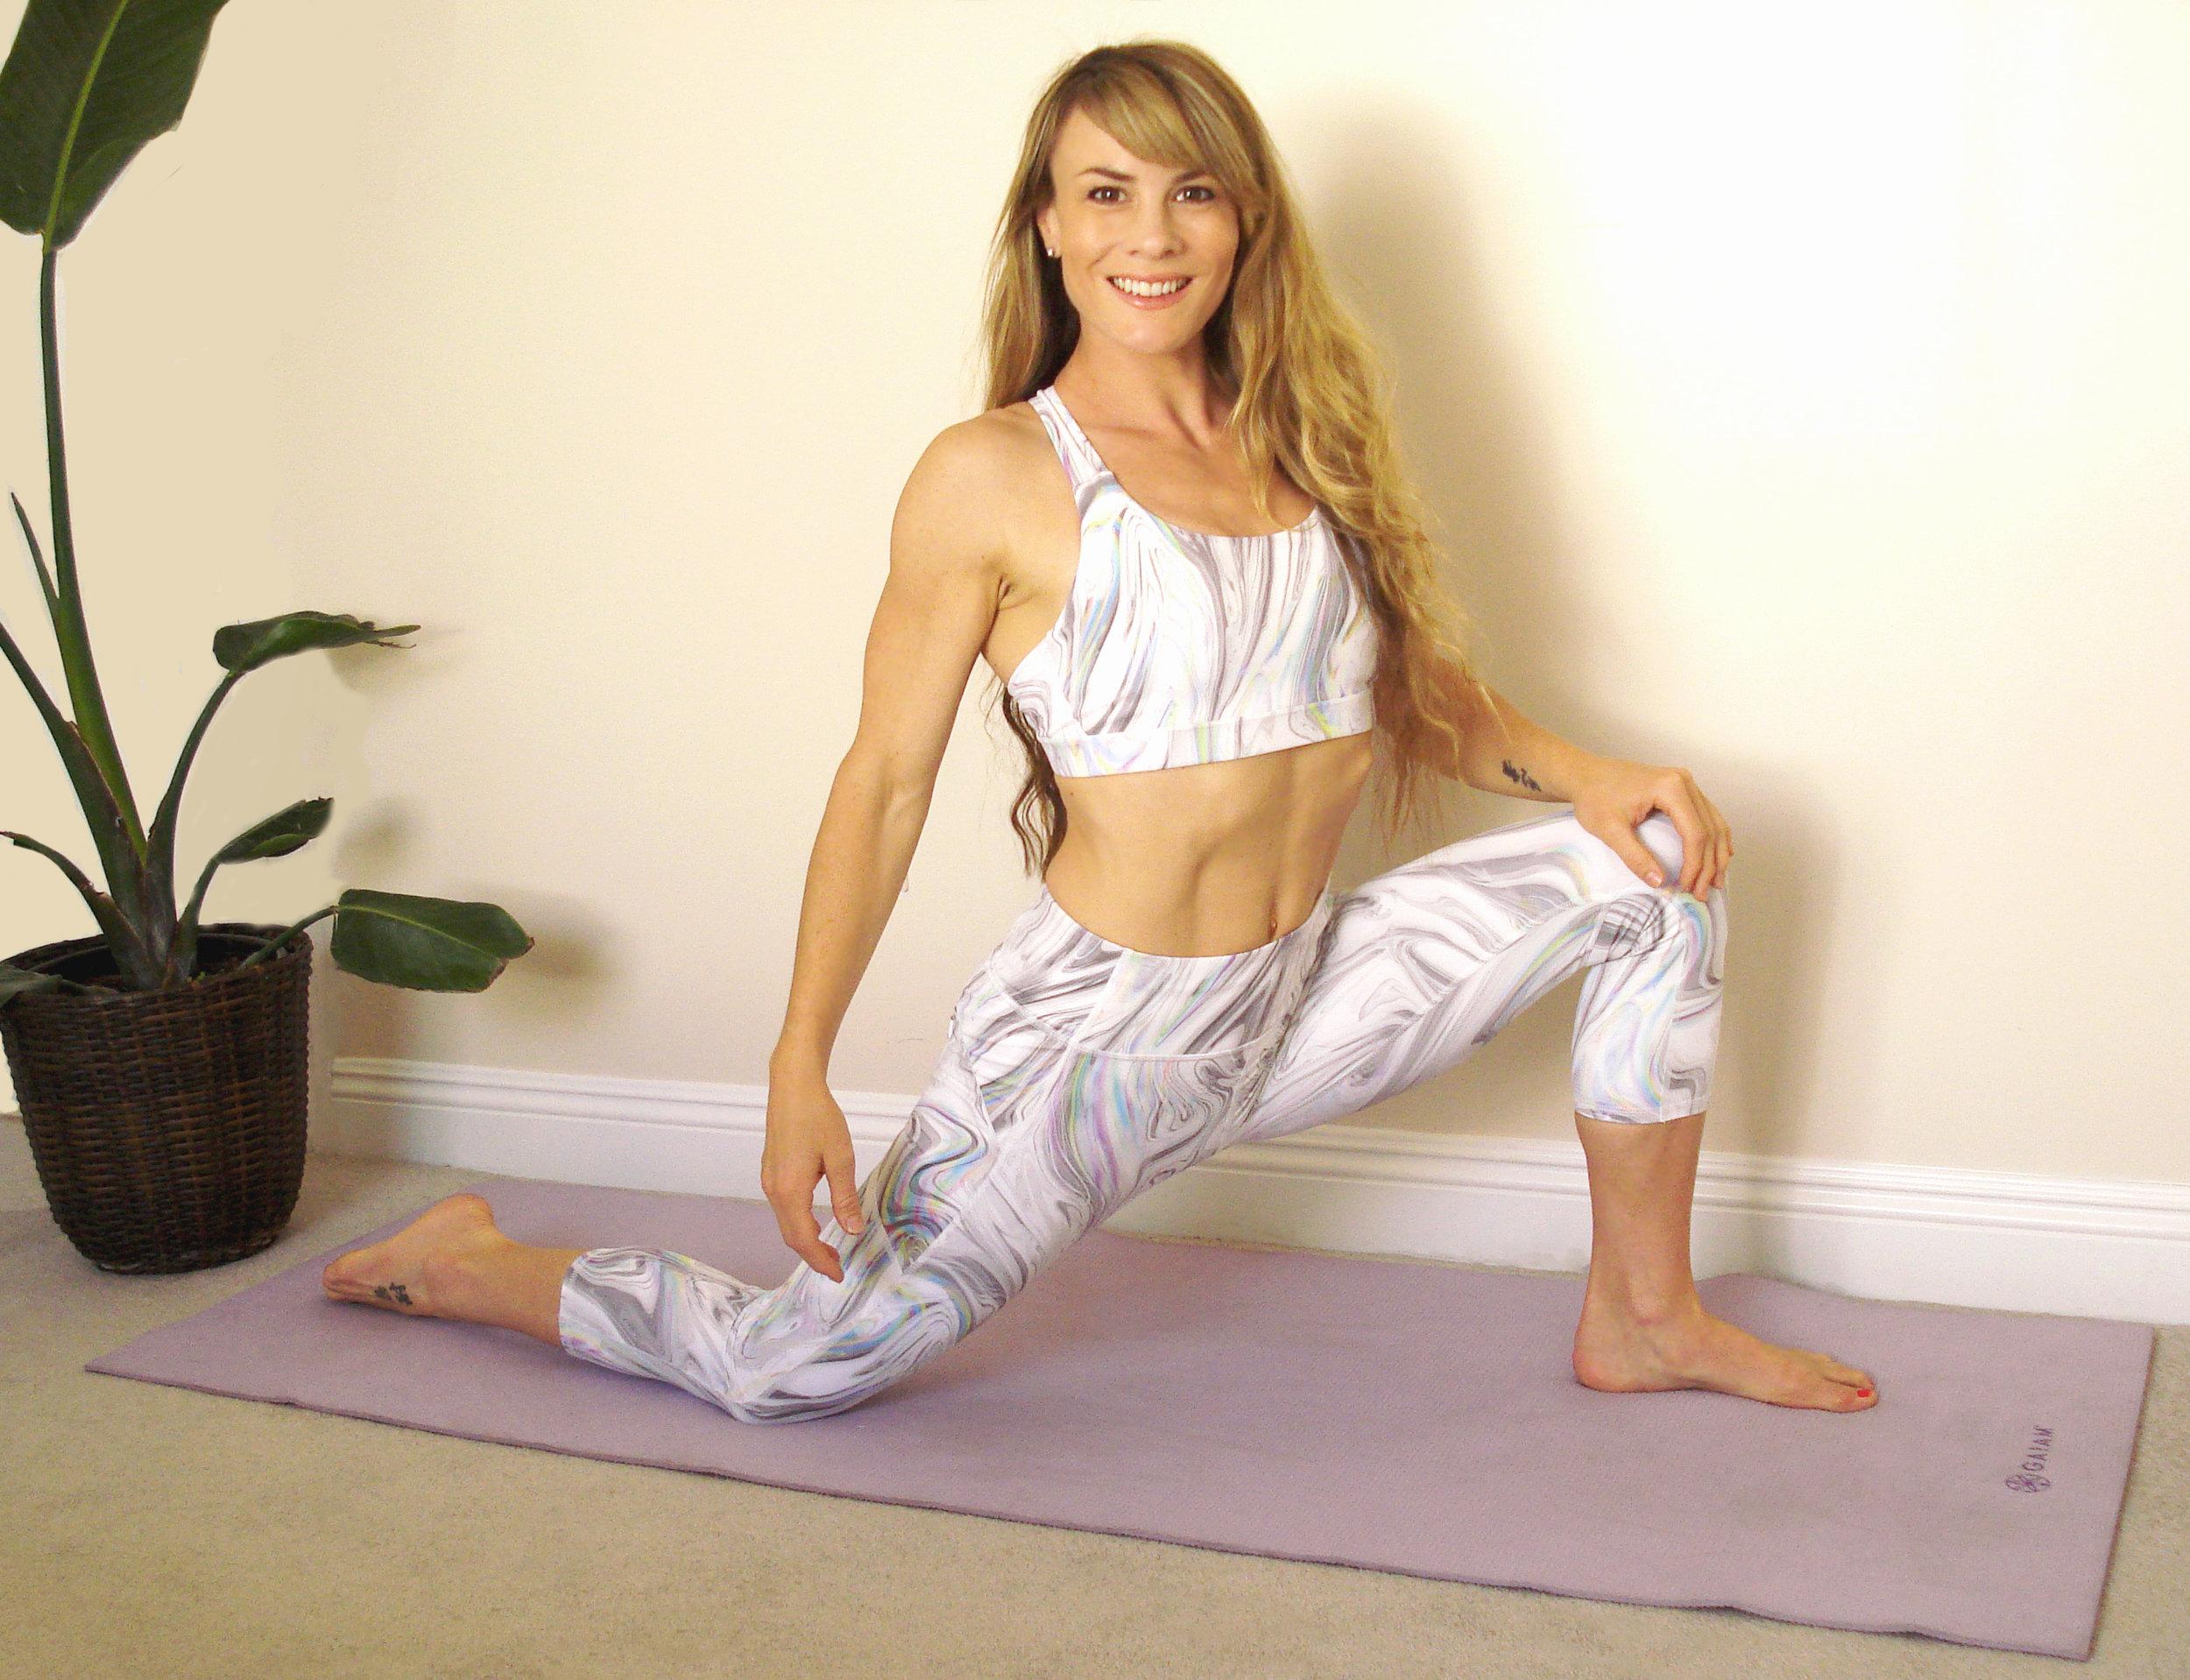 Rocking my matching set. Athleta marble leggings and sports bra.